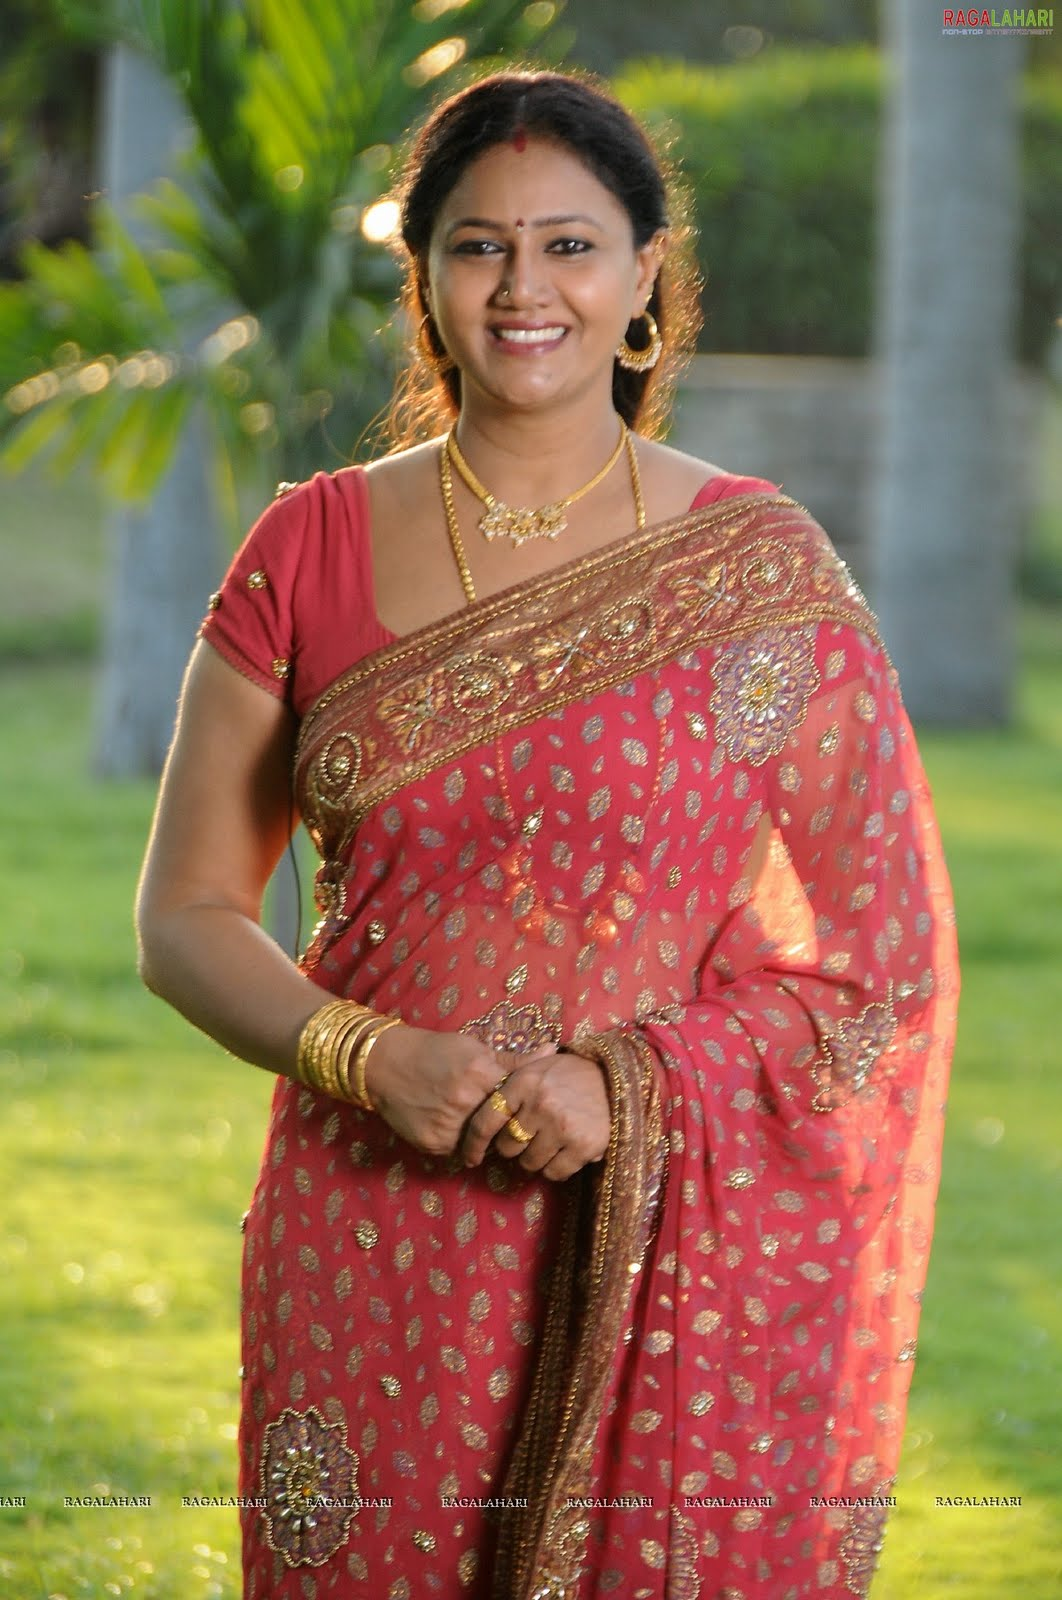 raksha actress aunty saree stills aunties tollywood latest still zone nagavalli resolution actresses posted seducing cinesizzlers